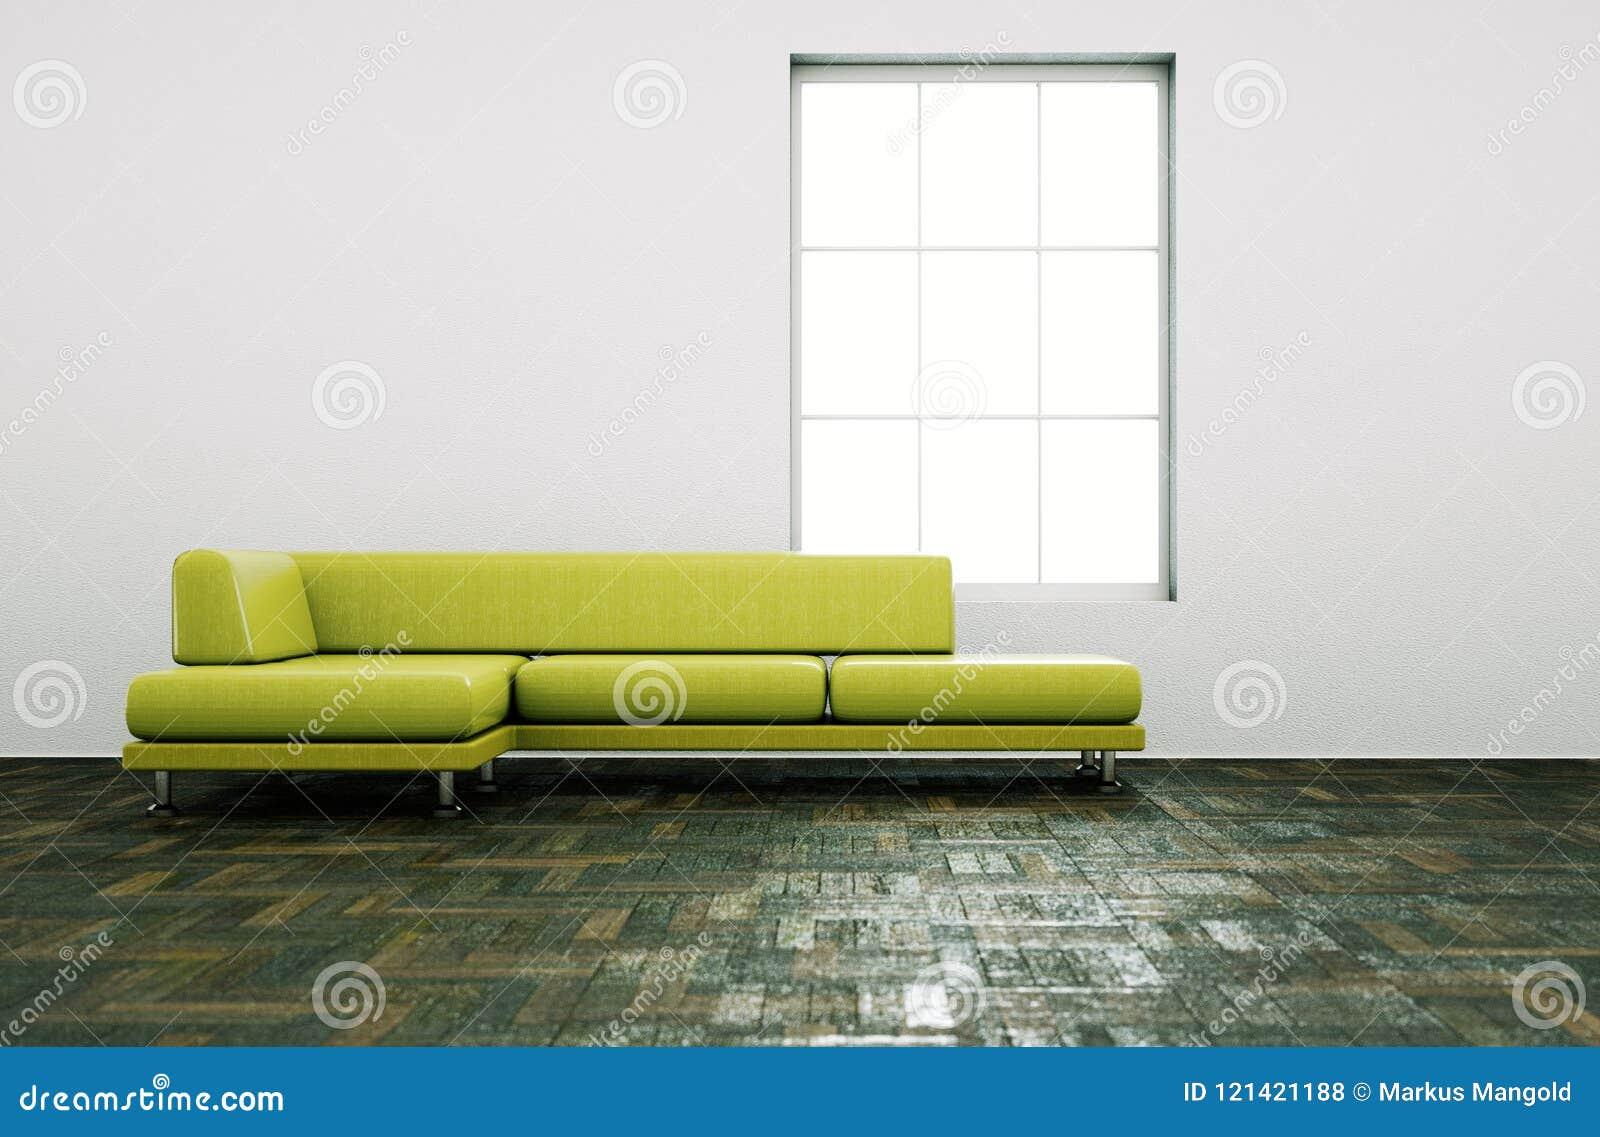 Enjoyable Interior Design Modern Bright Room With Black Sofa Stock Beatyapartments Chair Design Images Beatyapartmentscom